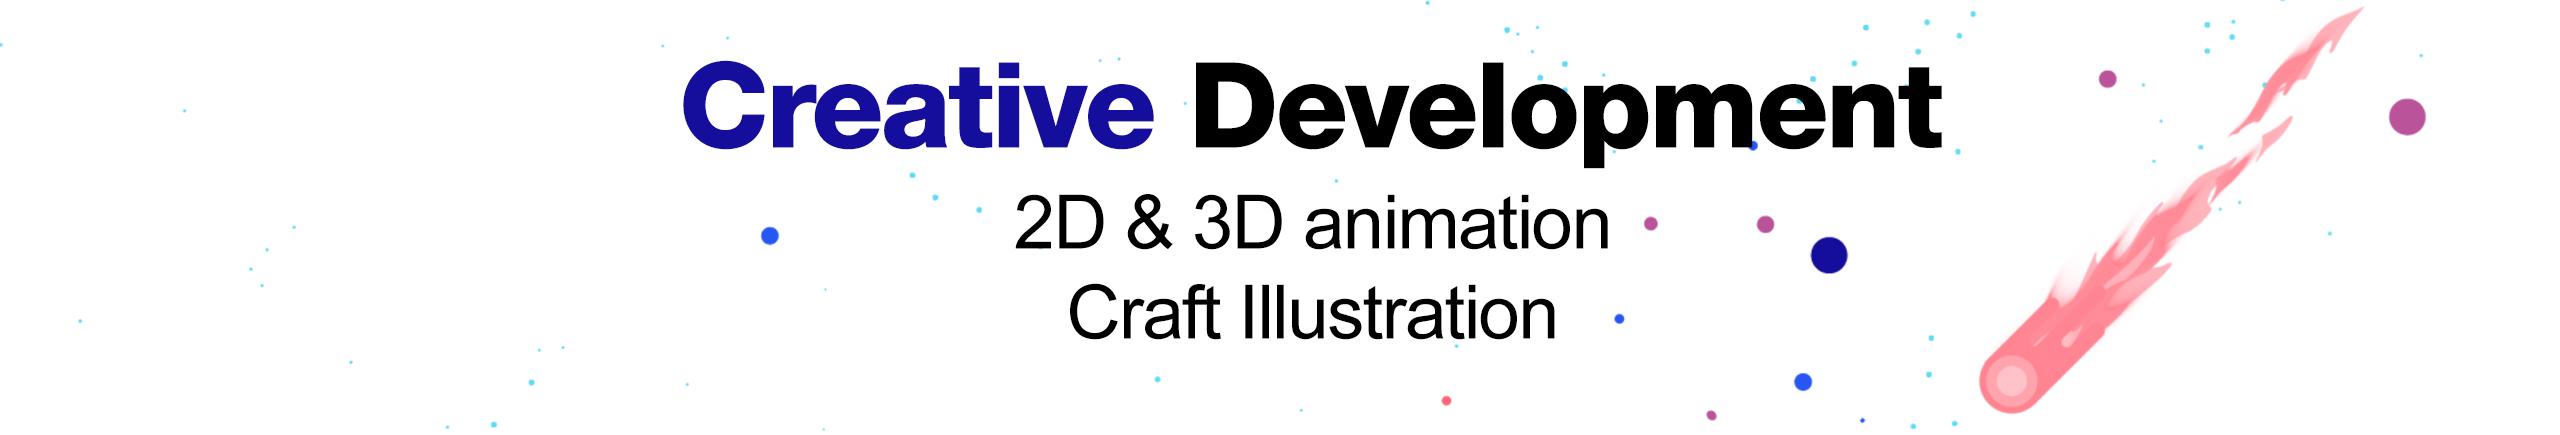 videomarketing-spots-explainer-videos-advertising-animation-2D-3D-motion-graphics-morgana-studios